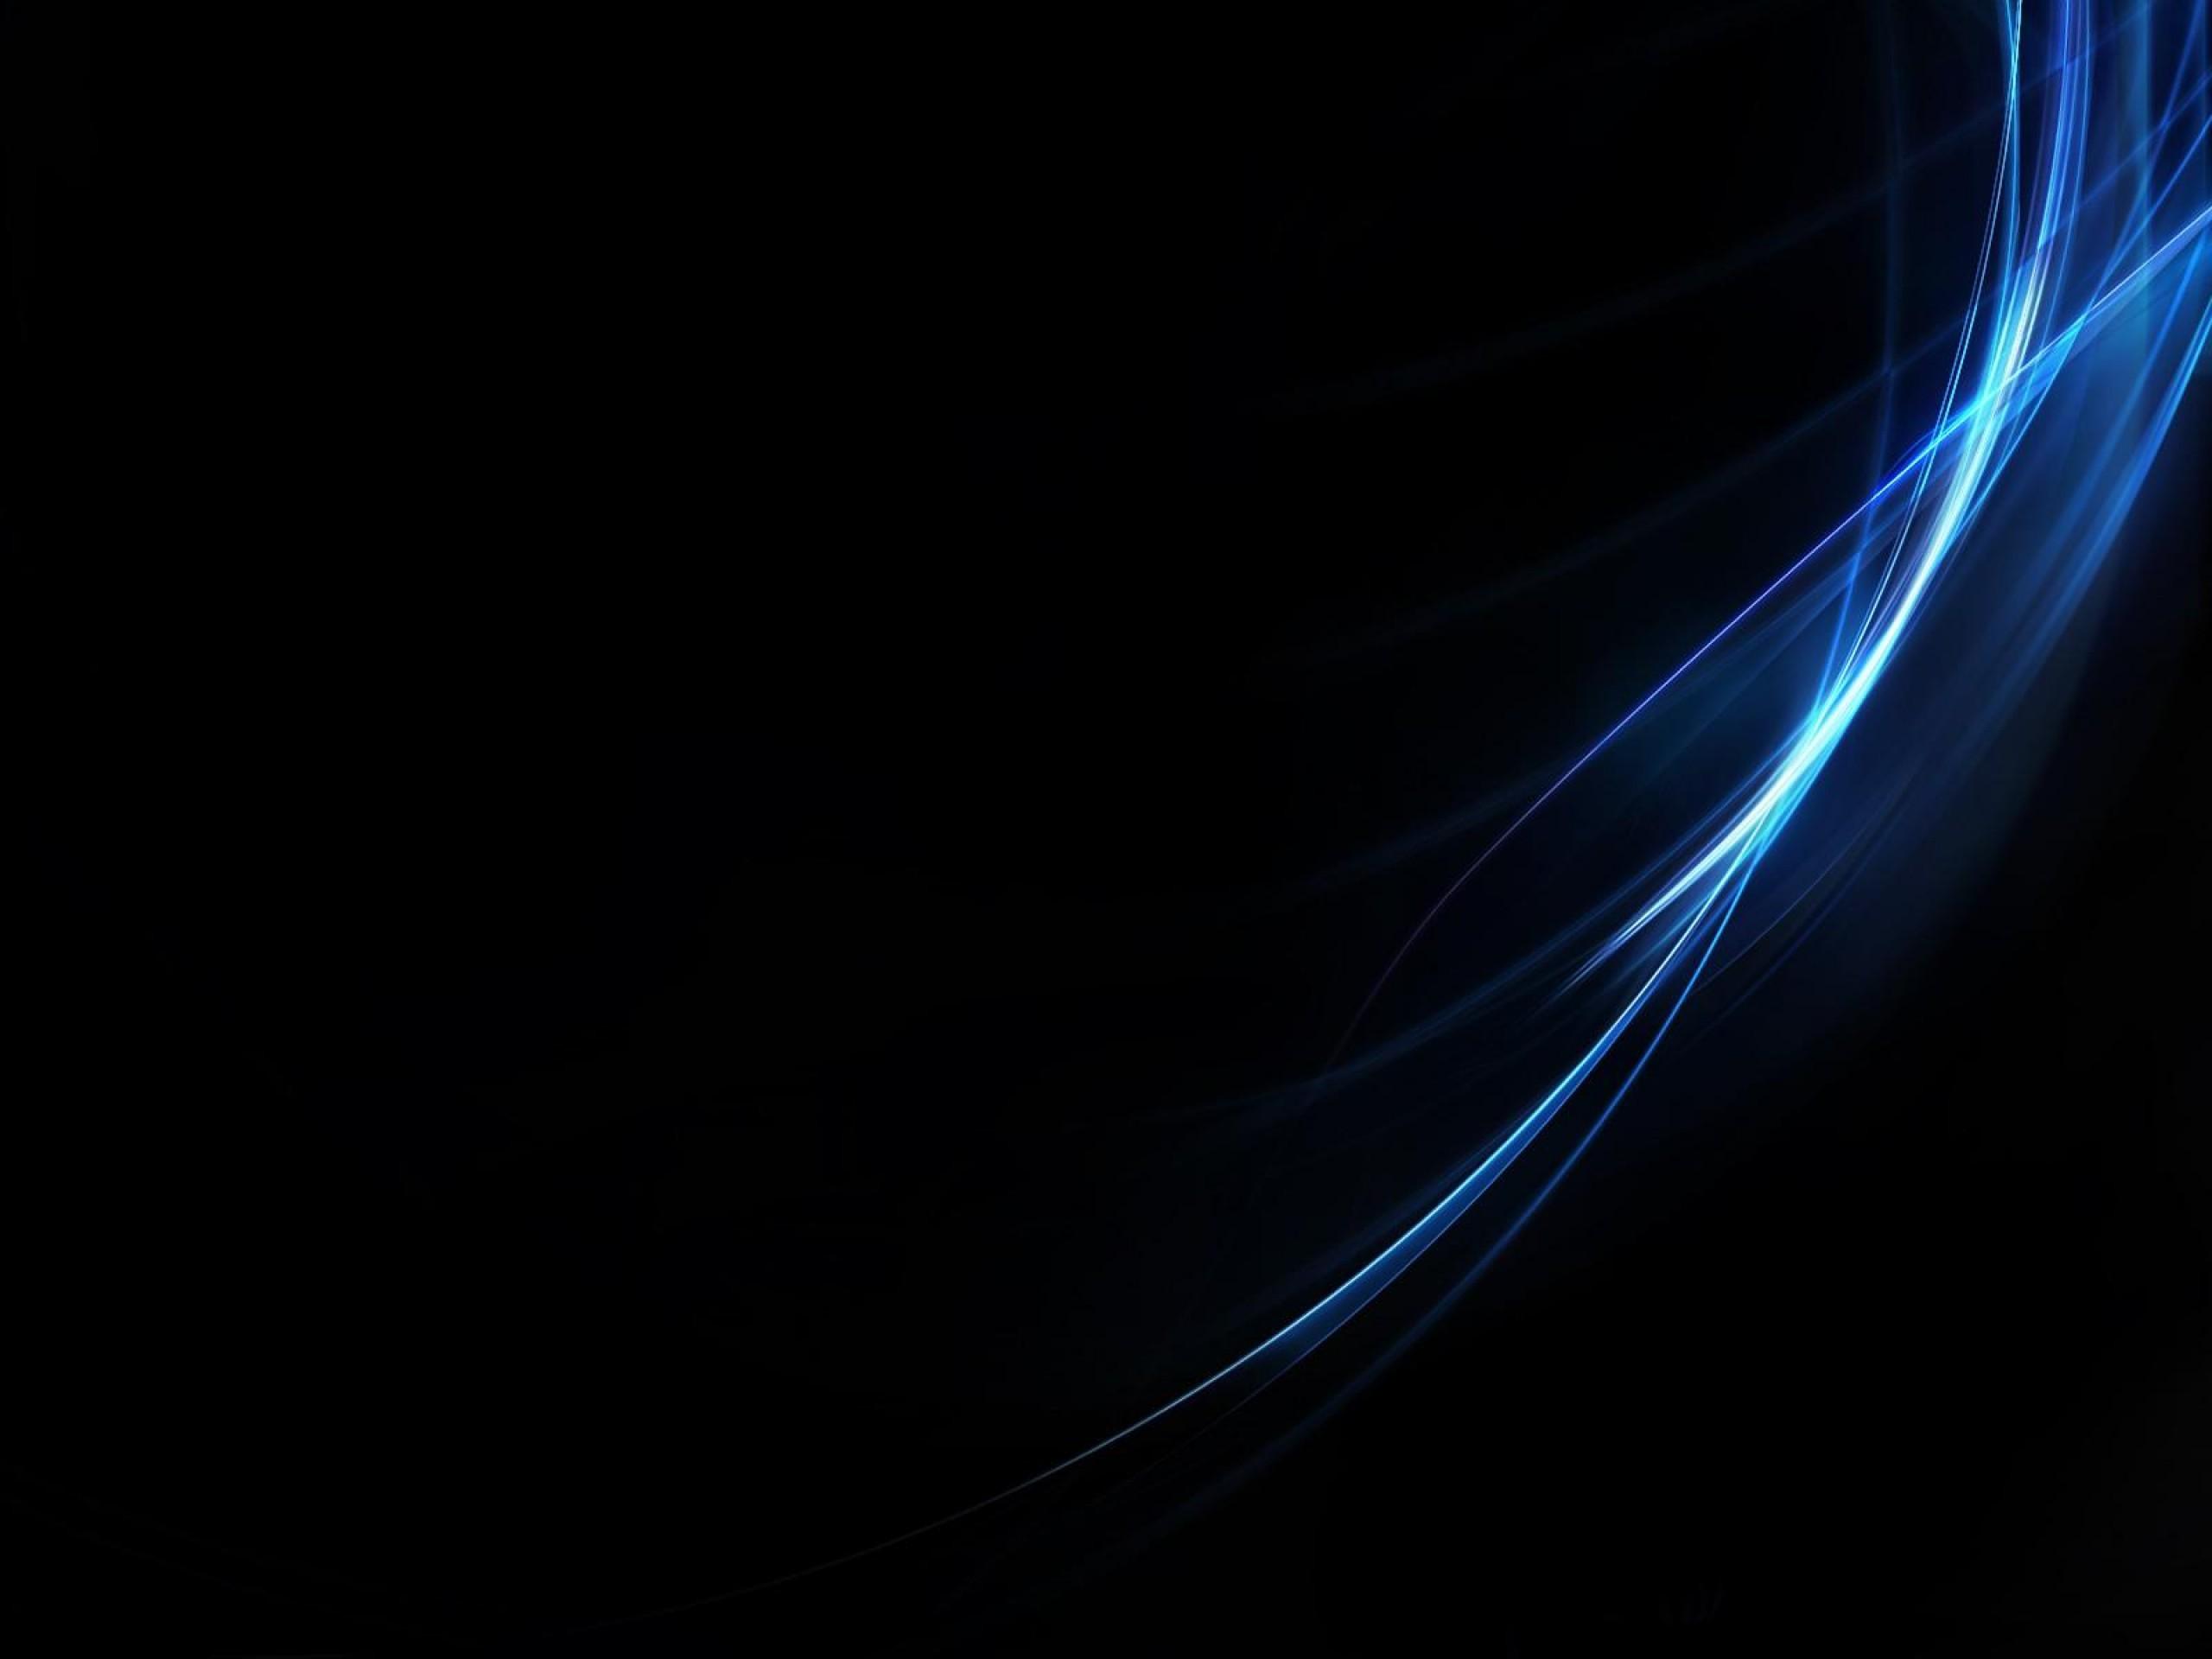 Black Abstract HD Wallpaper-3